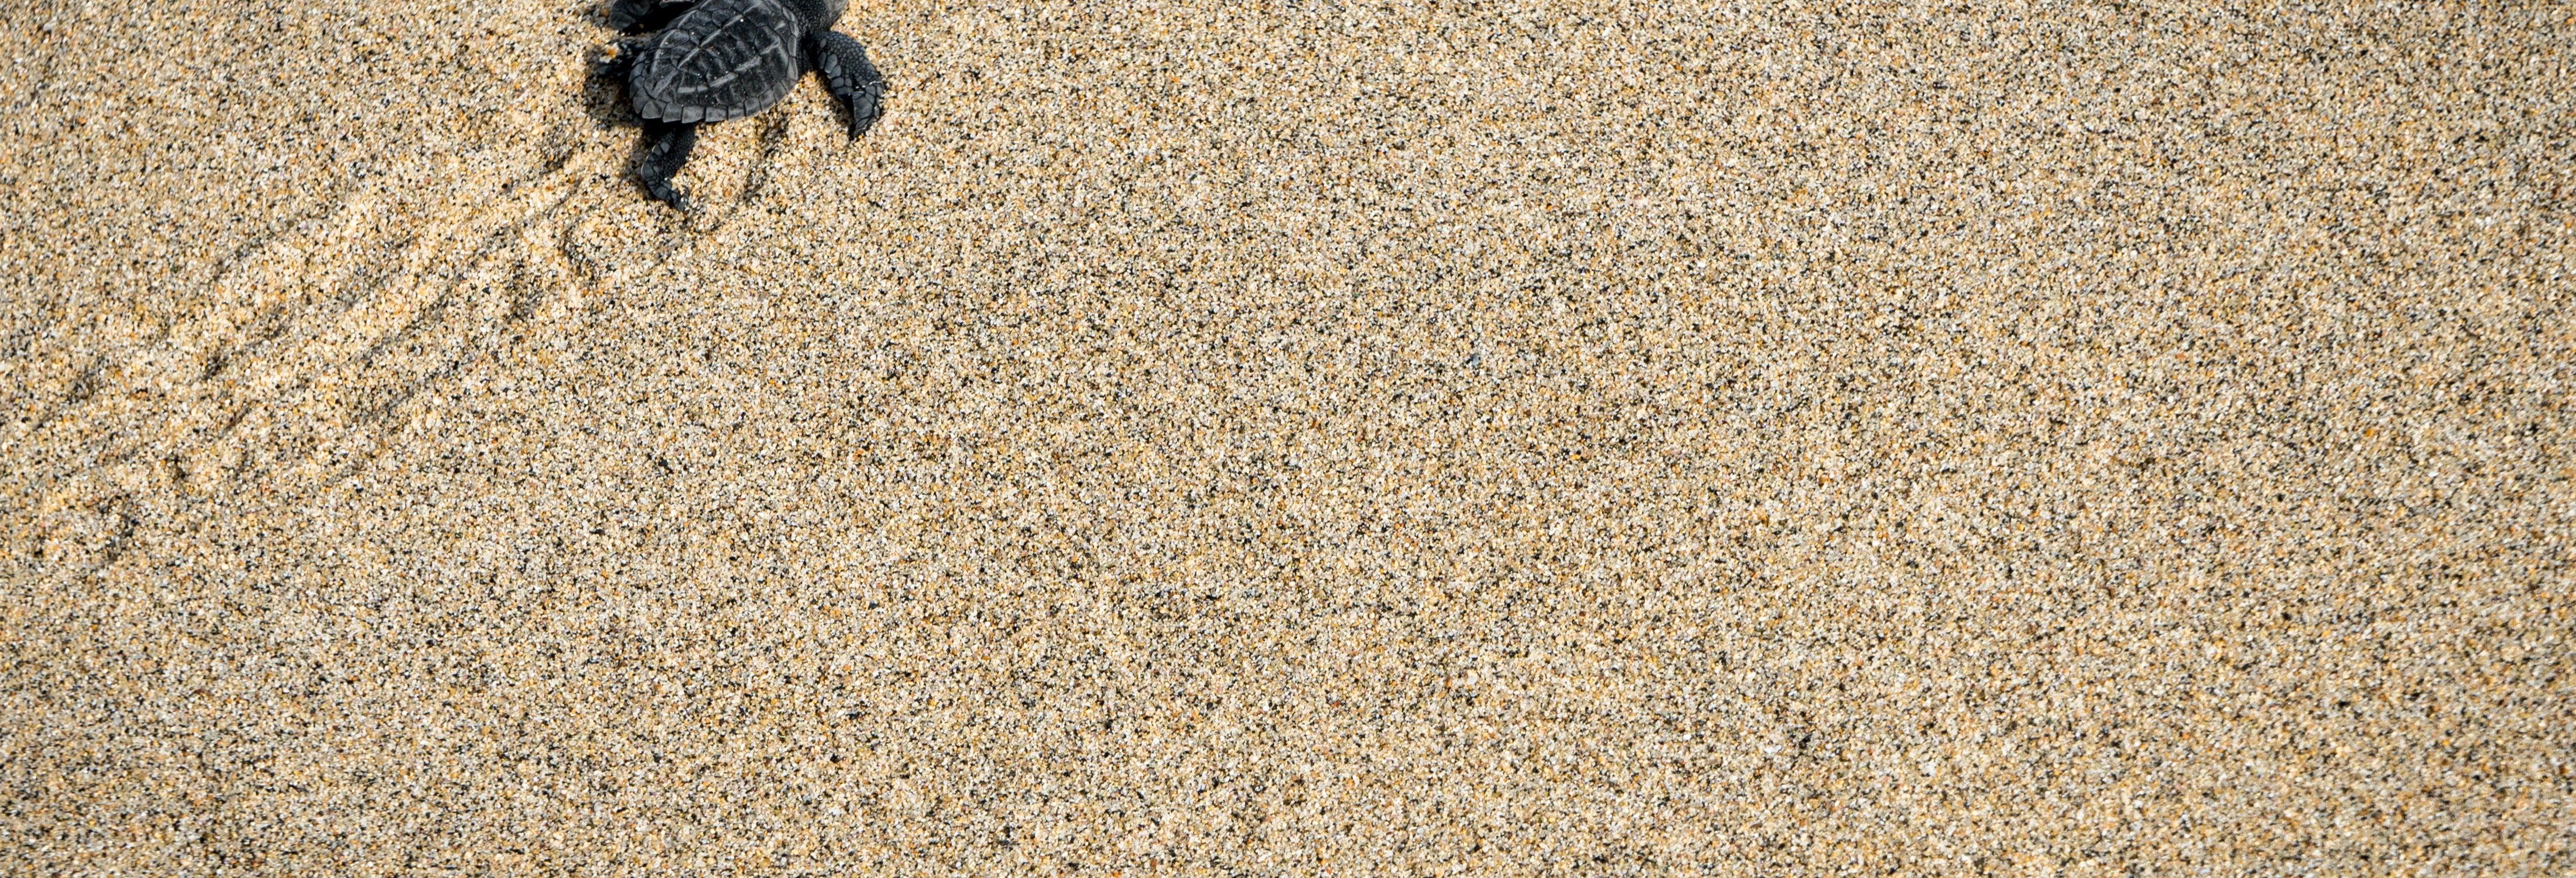 Liberación de tortugas en Puerto Escondido desde Huatulco